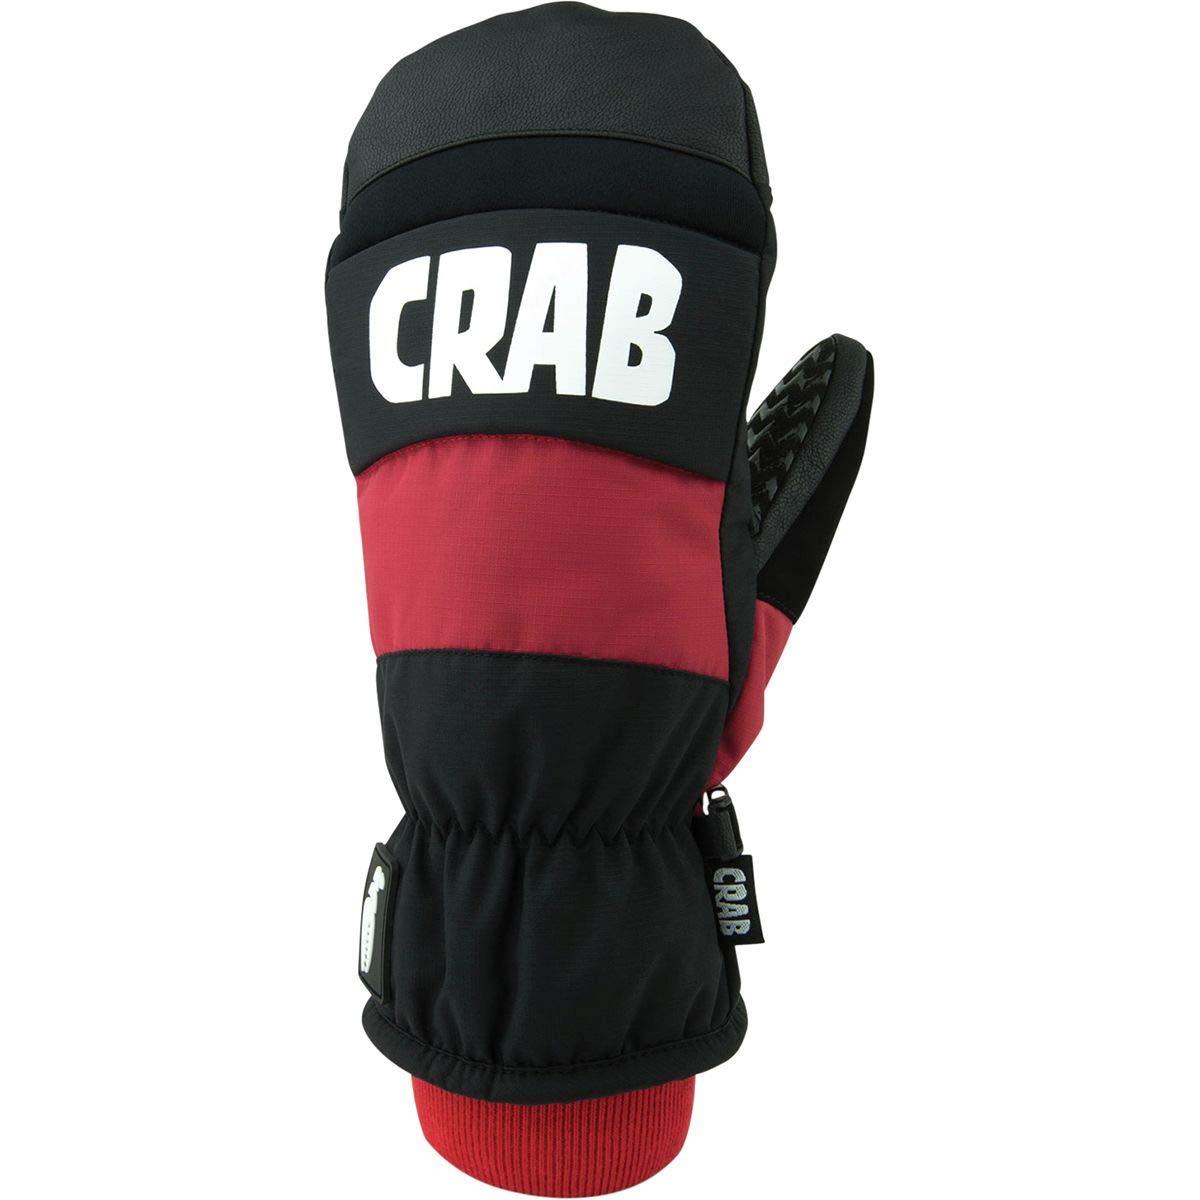 Crab Grab Punch Mitt - Men's